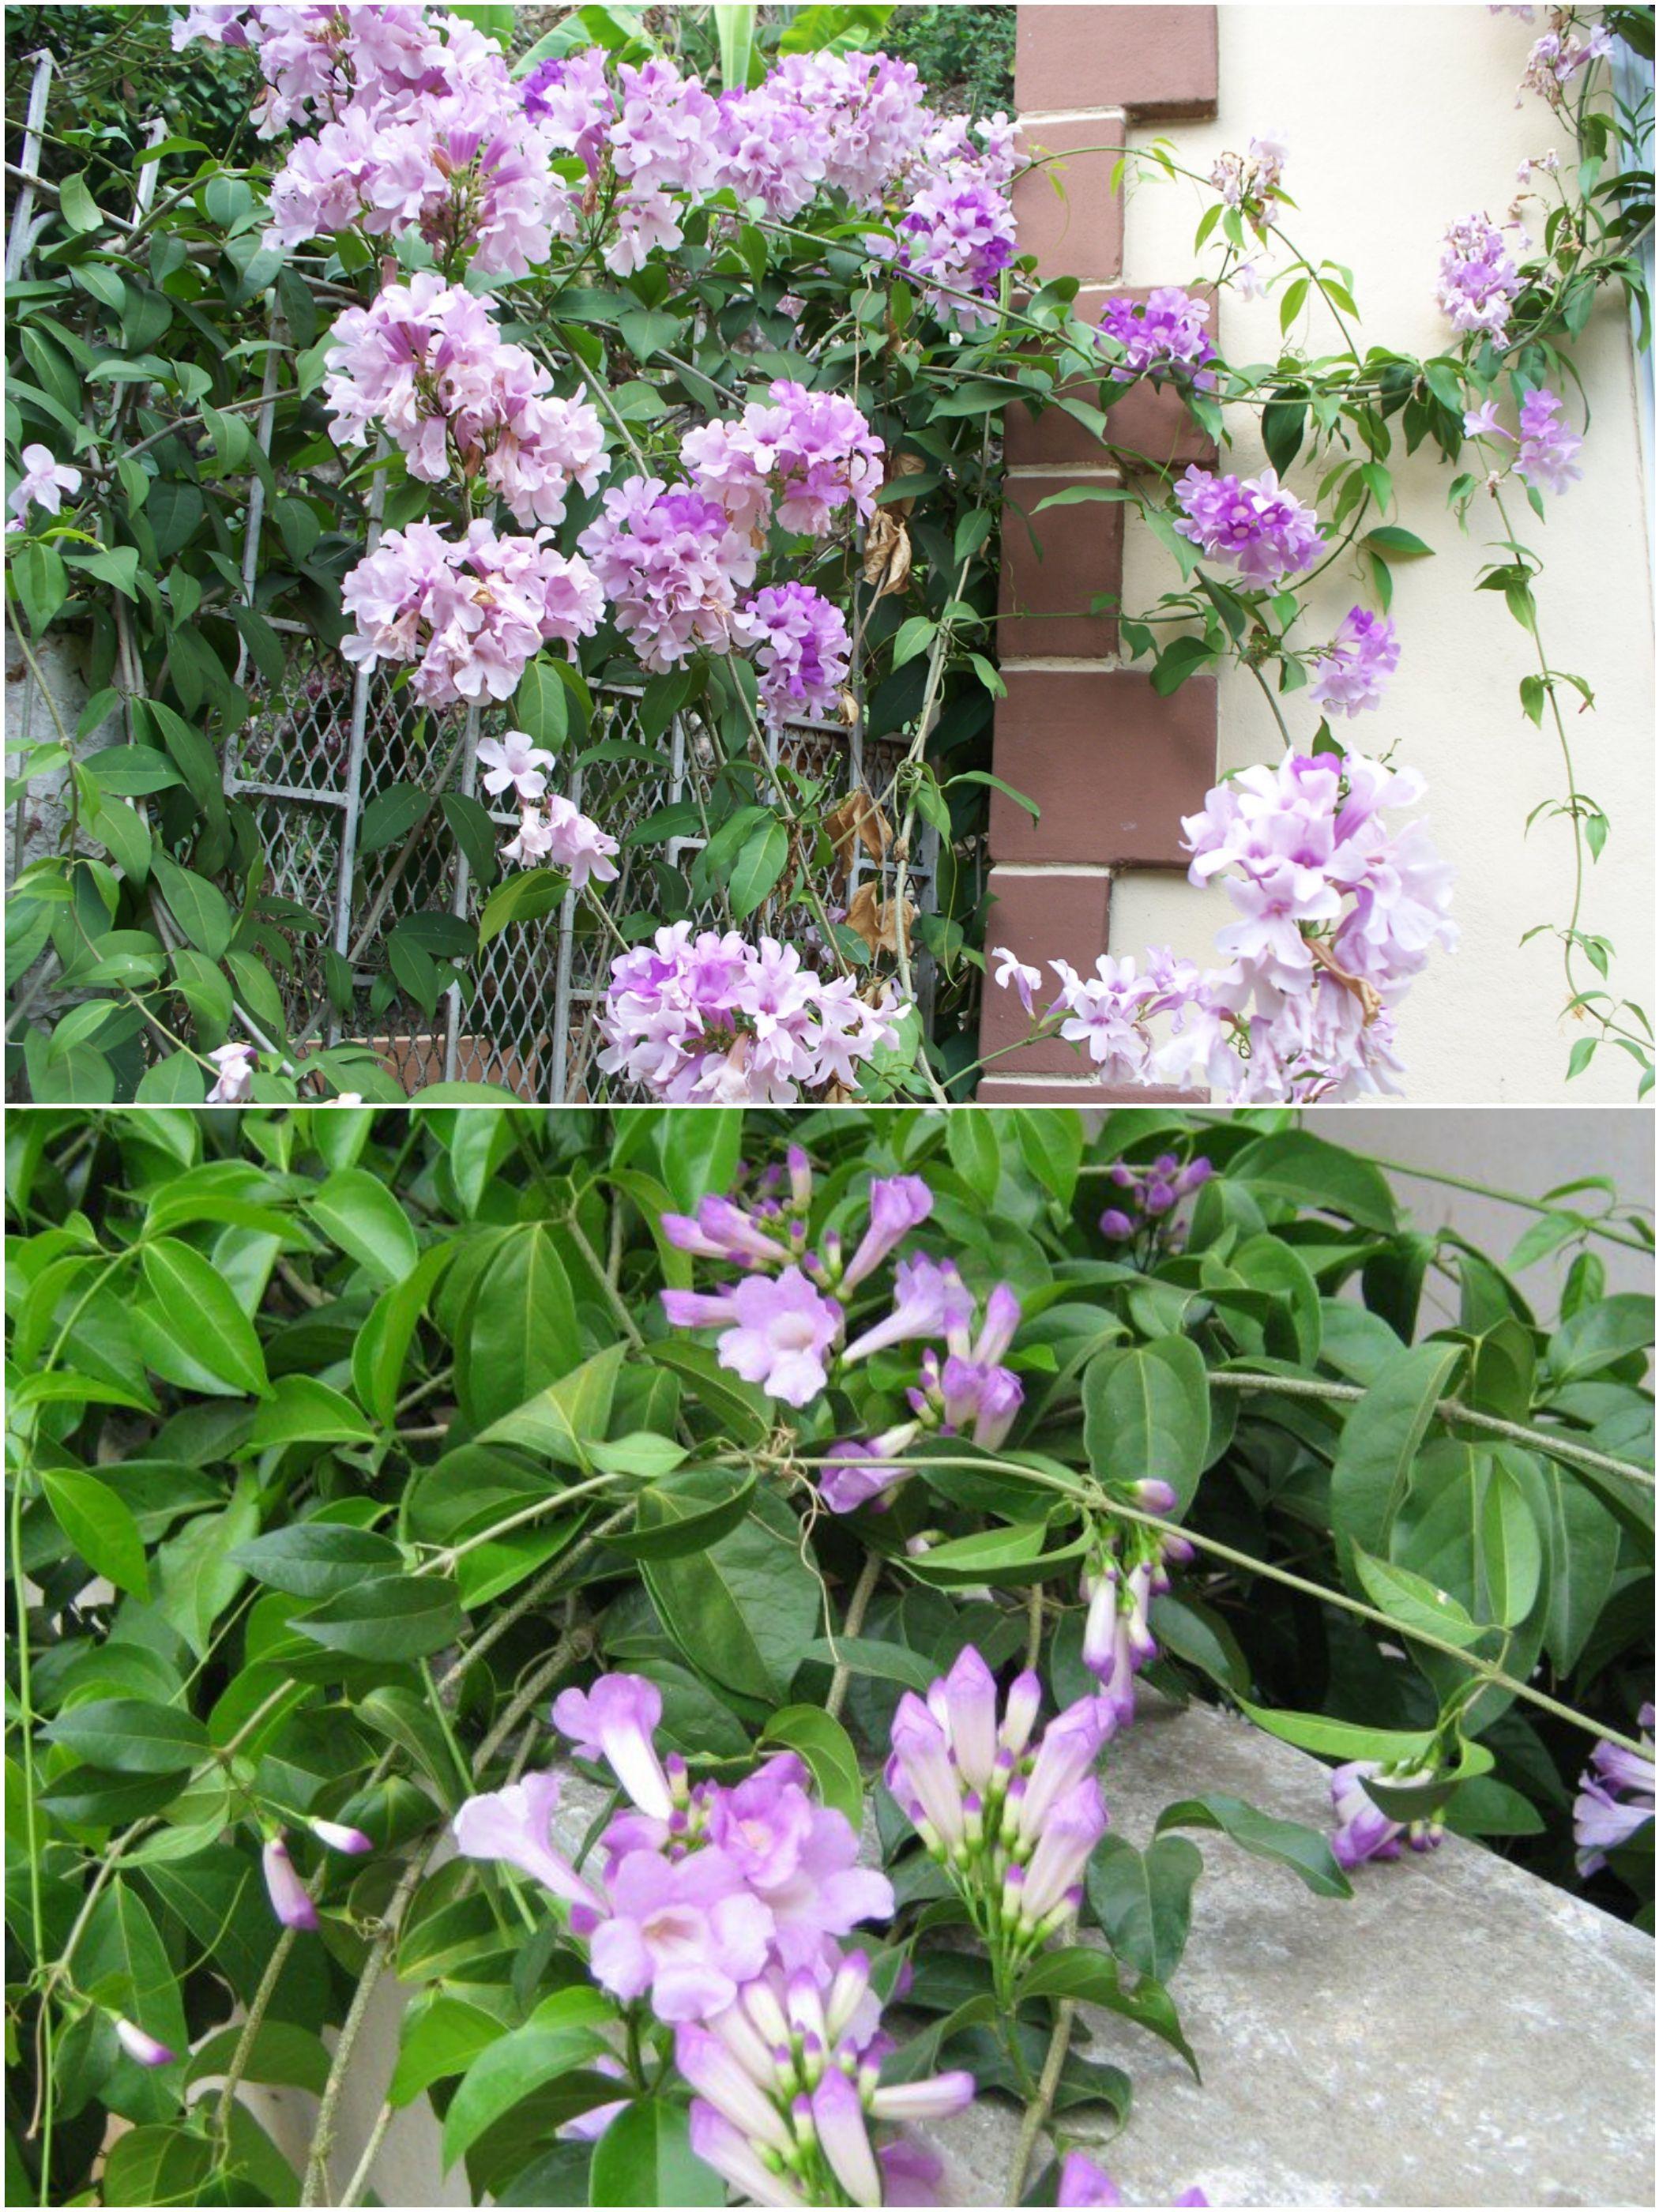 Garlic Vine Flower Flowers Of Bangladesh Pinterest